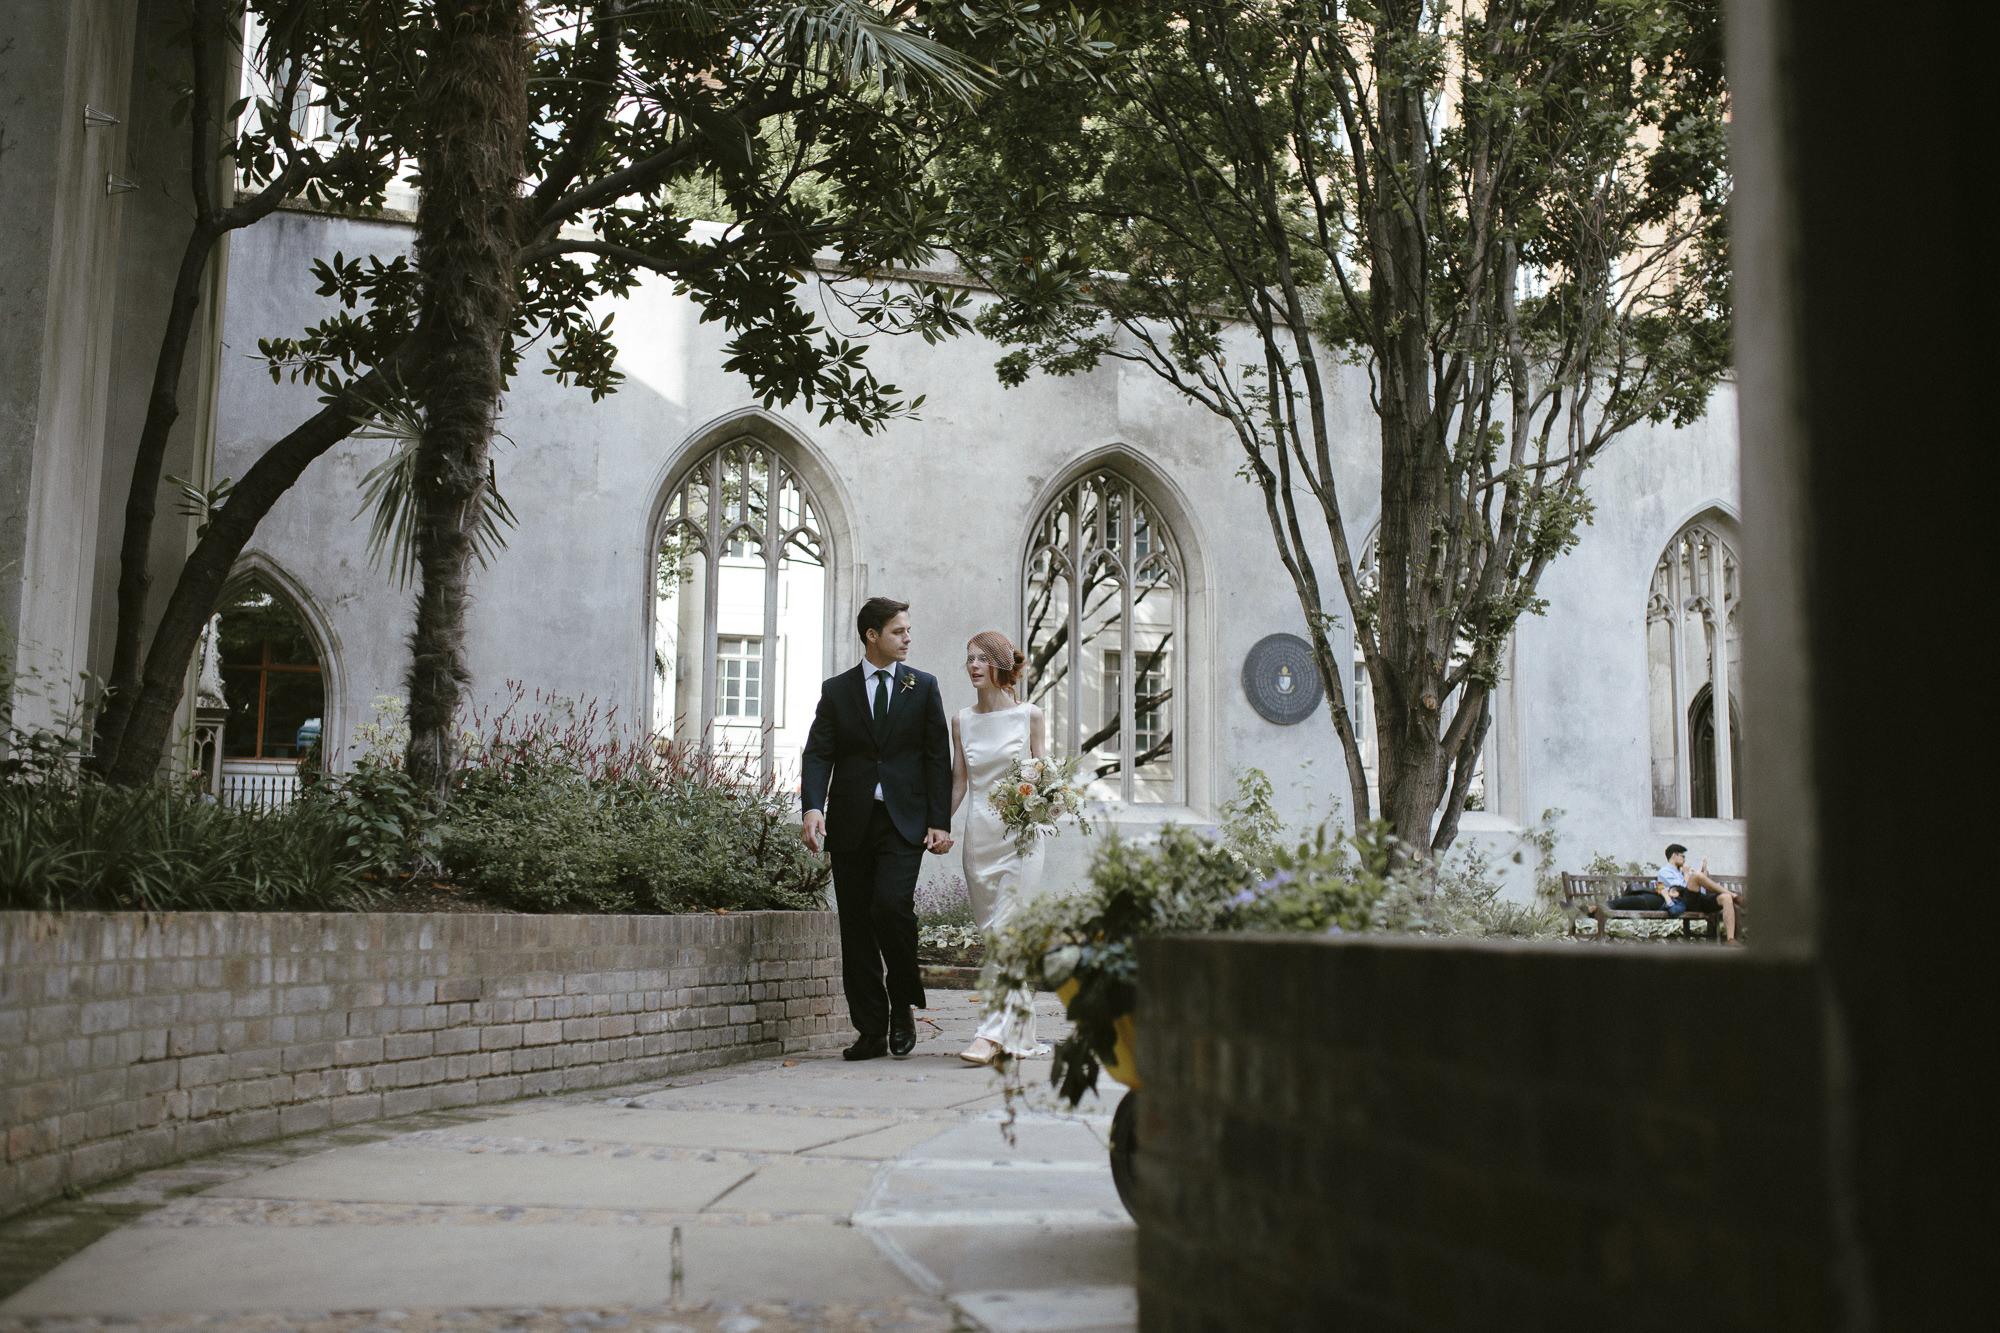 London-Wedding-St-Helens-72.jpg